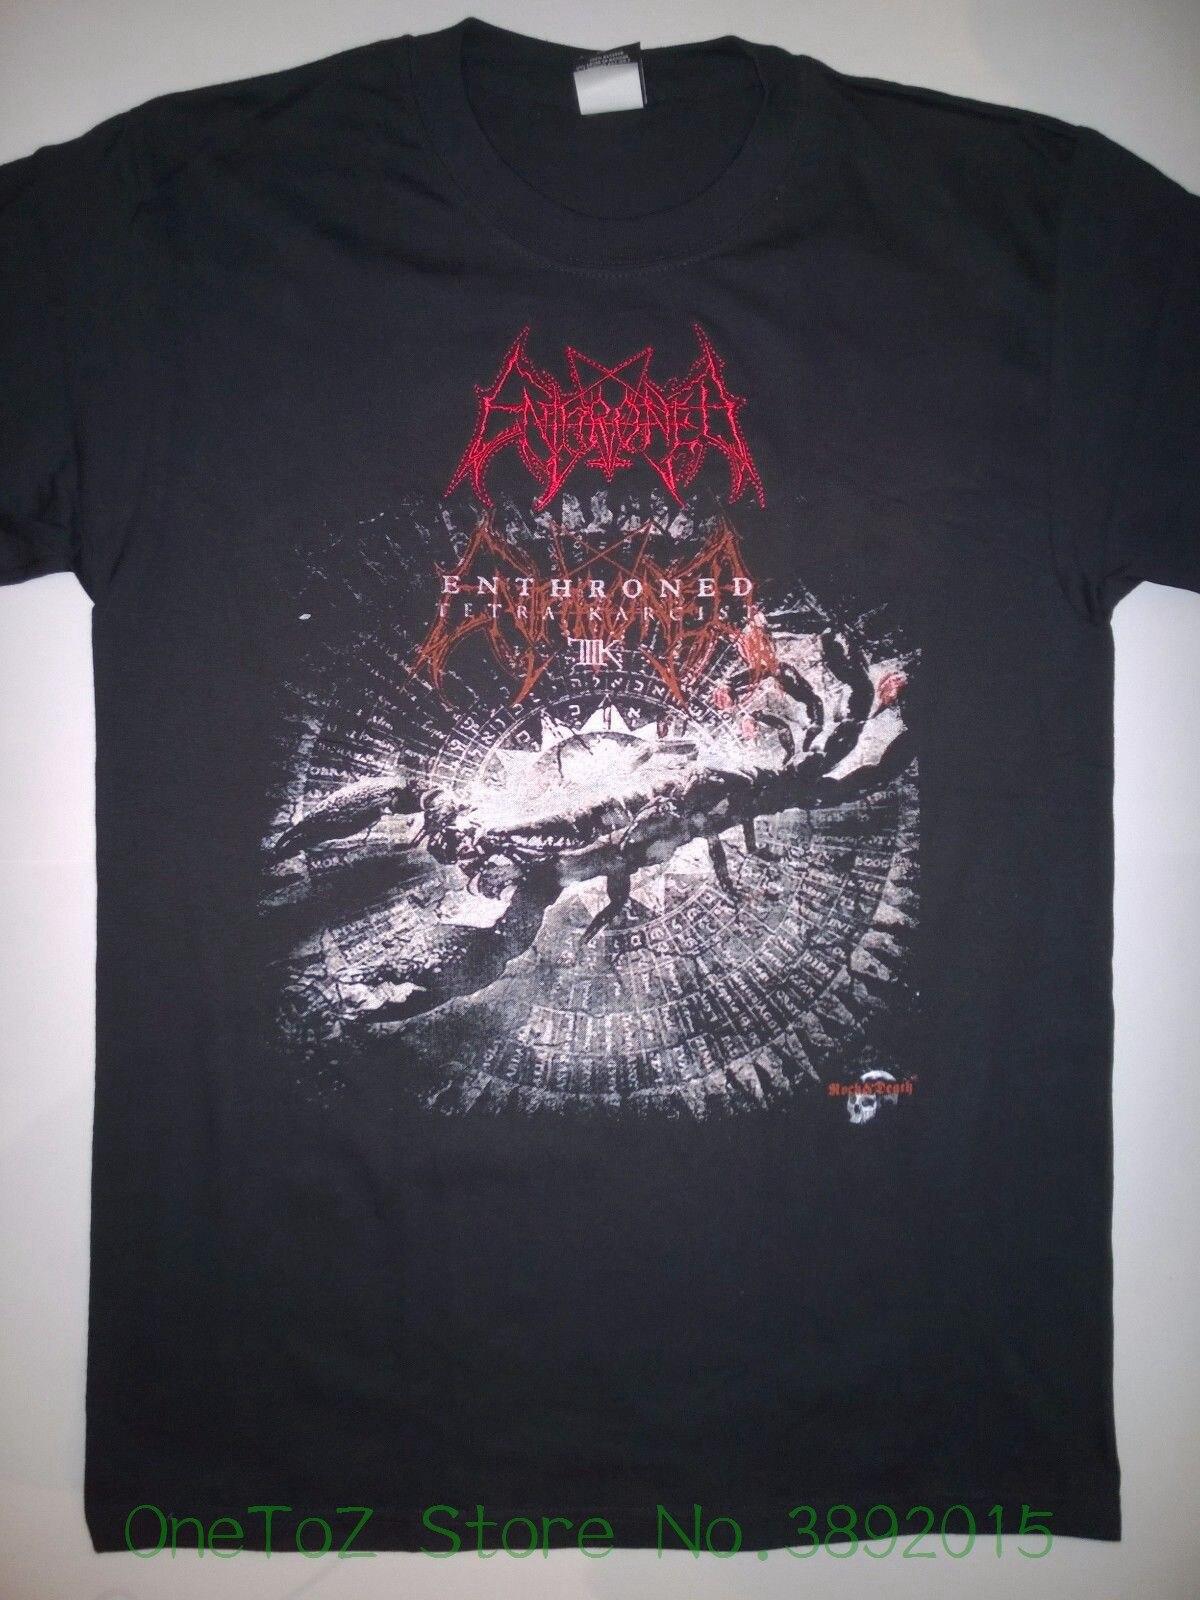 Camisetas de alta calidad para hombre, camiseta entronada mediana, Logo bordado raro,...